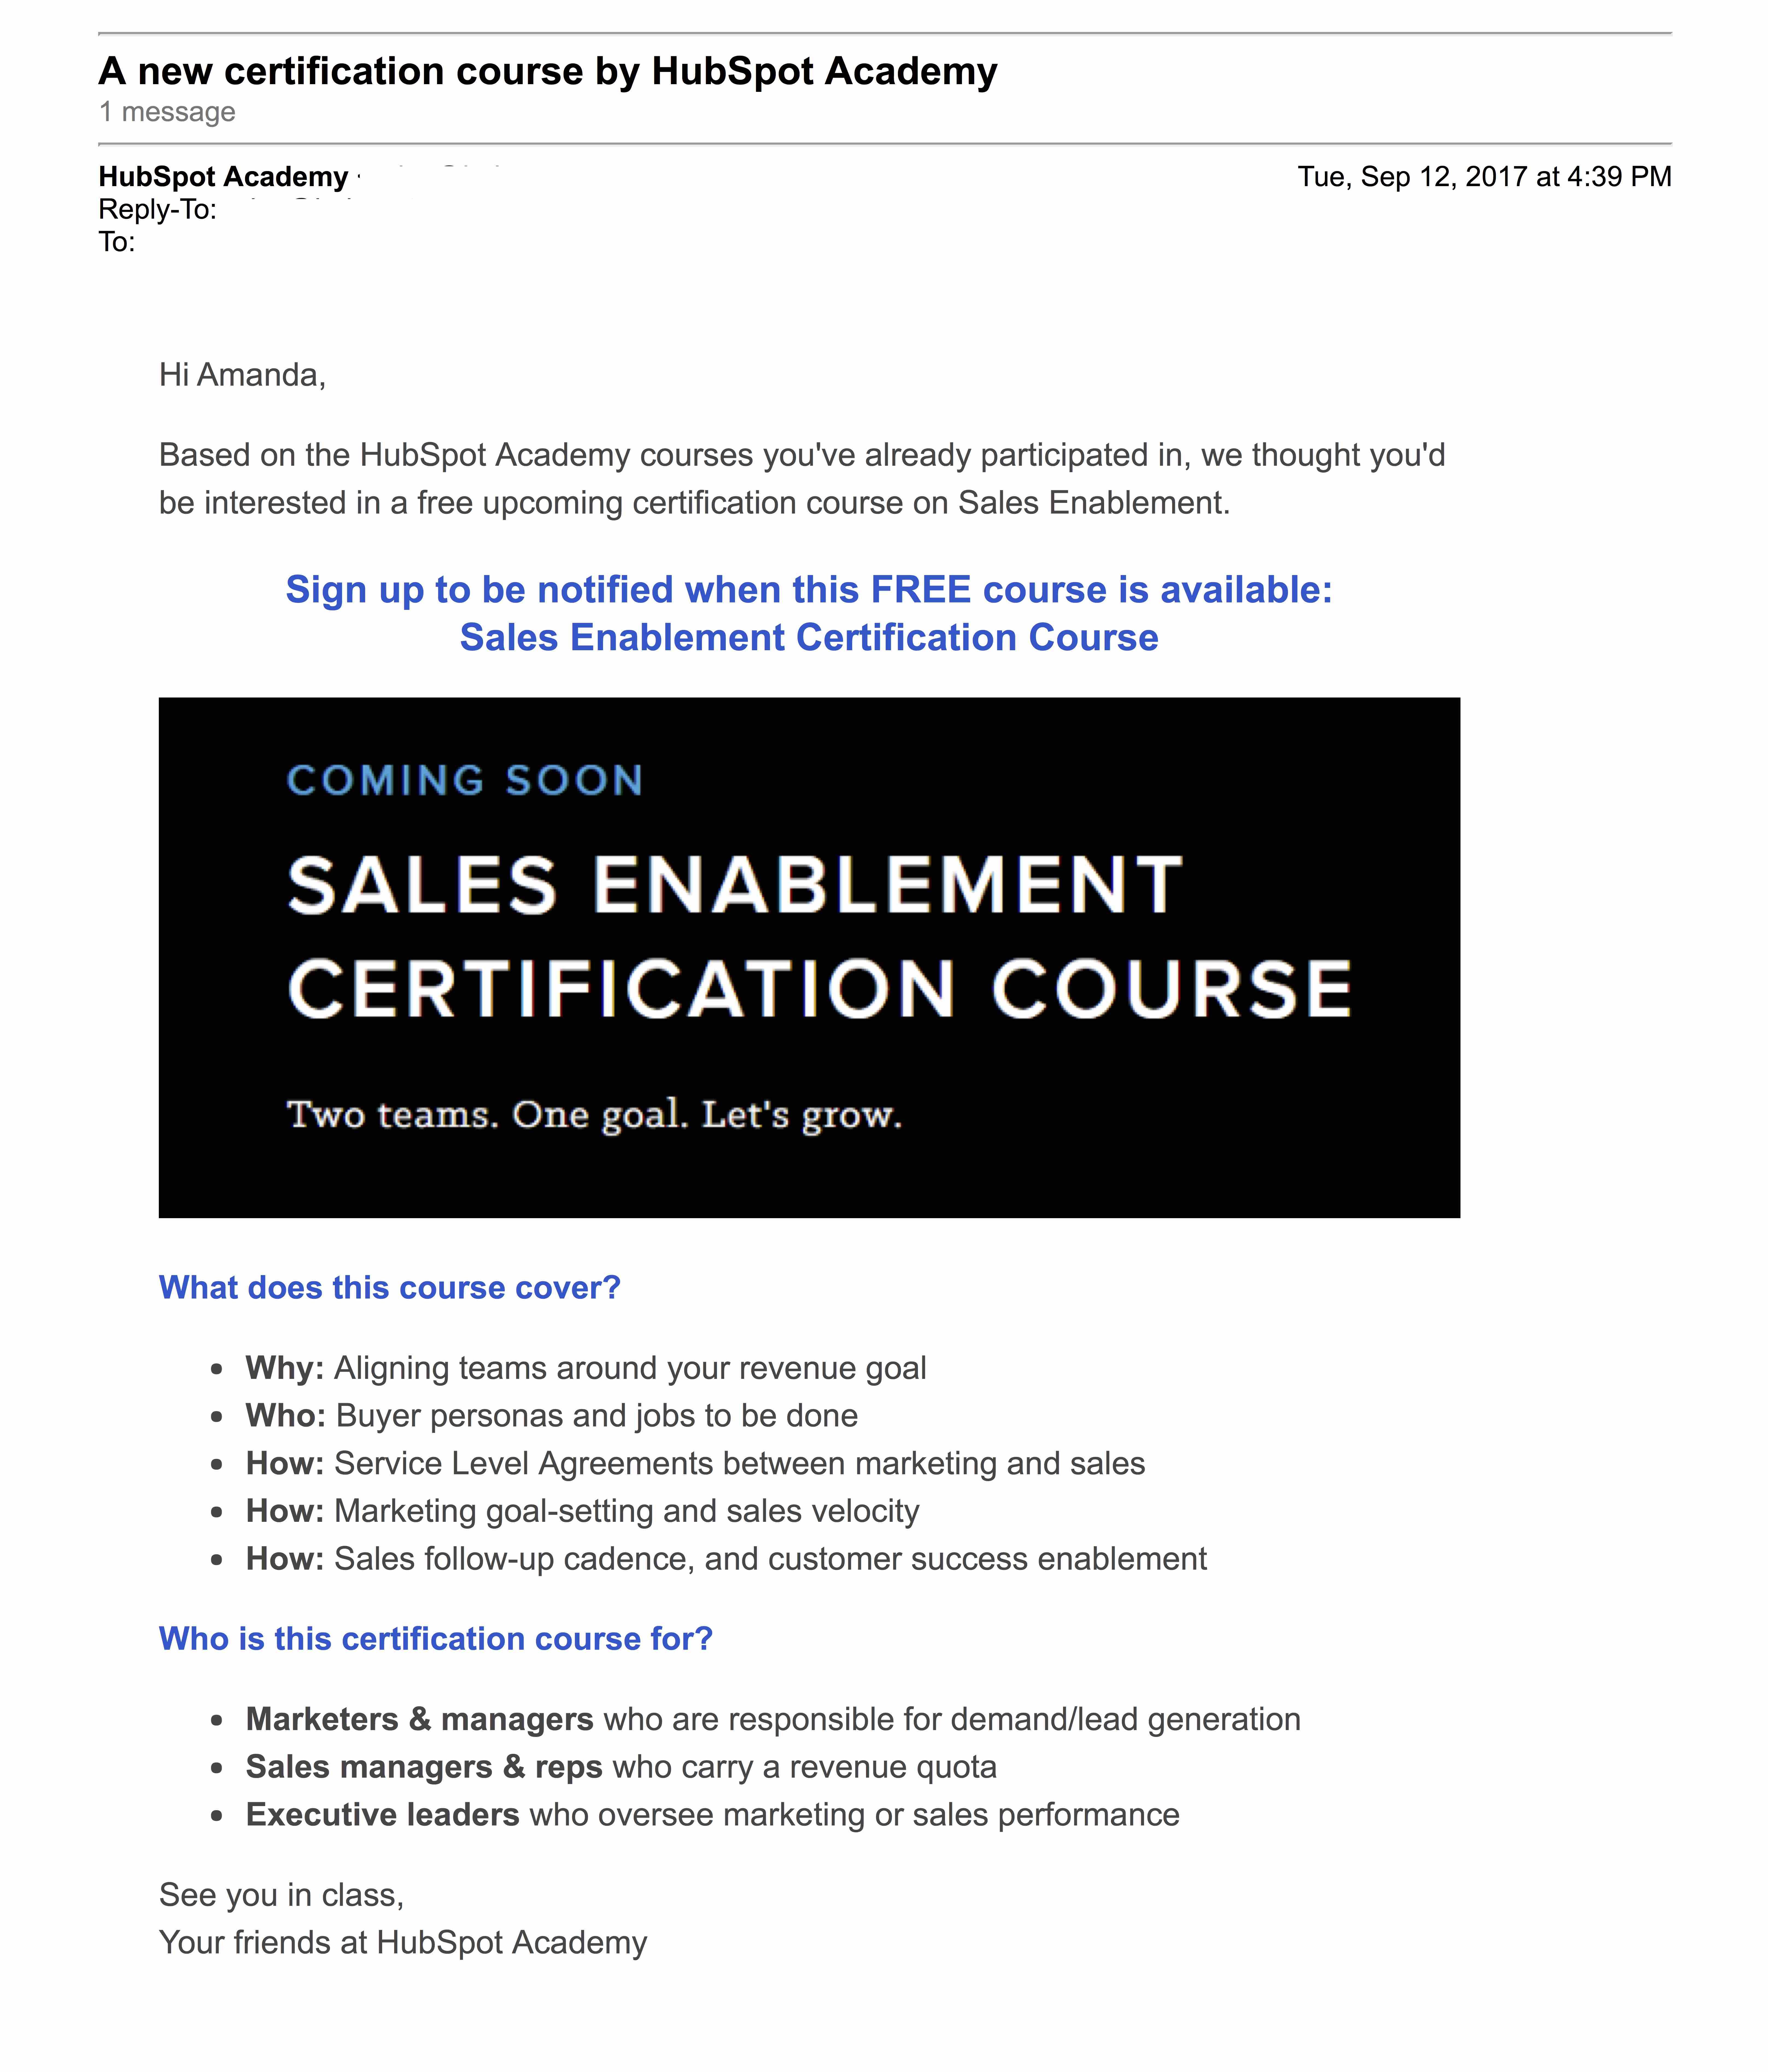 HubSpot Mail - A new certification course by HubSpot Academy